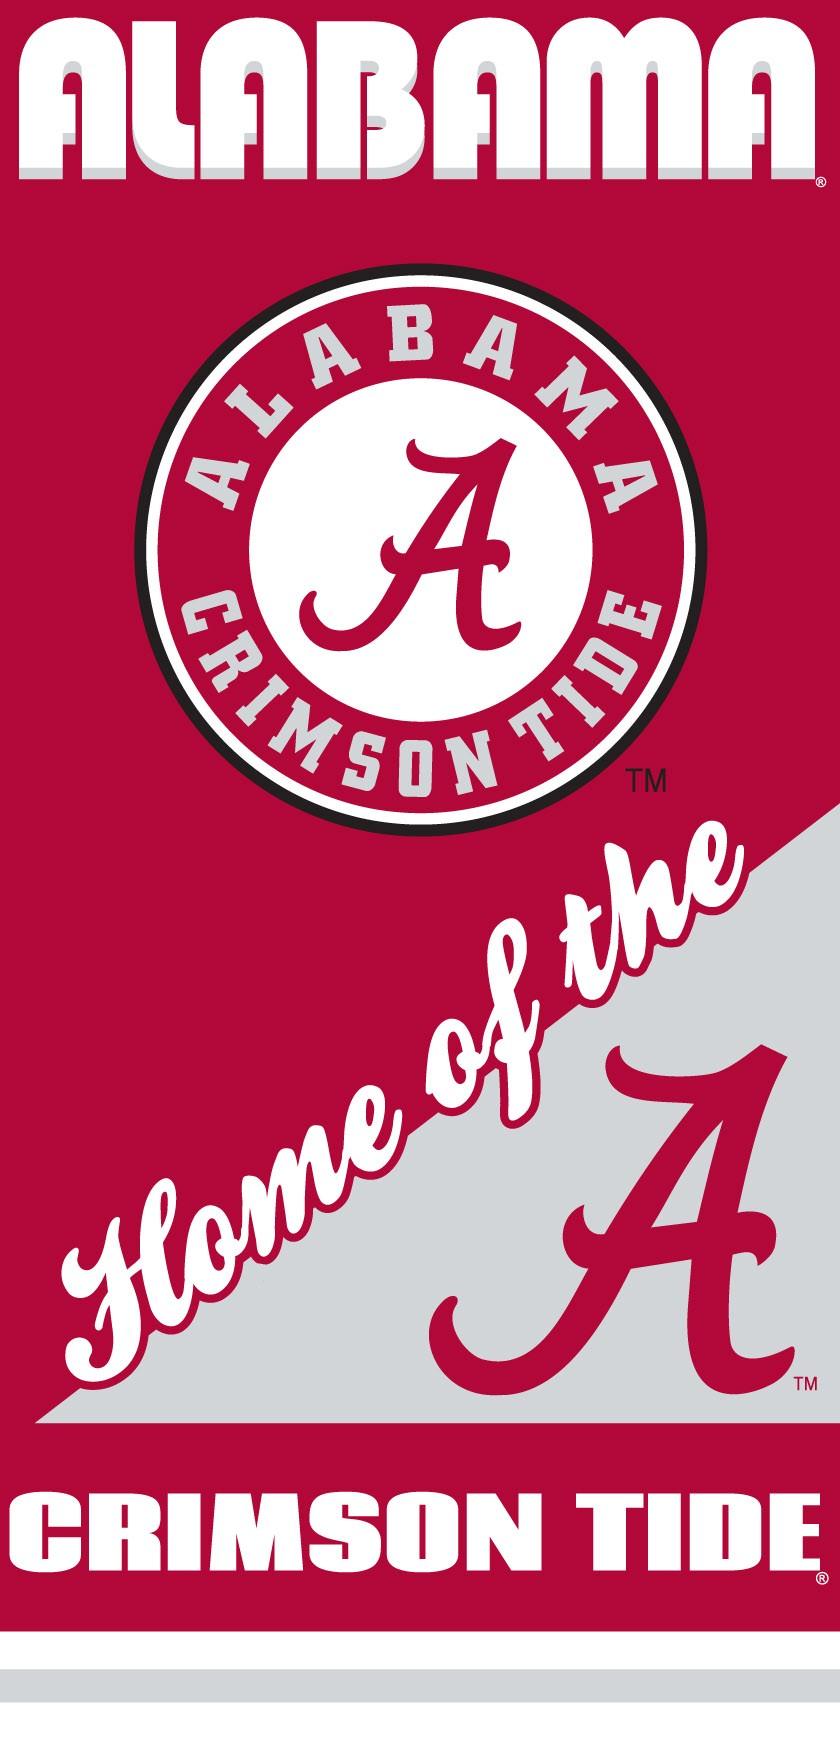 Alabama Crimson Tide Home Beach Towel